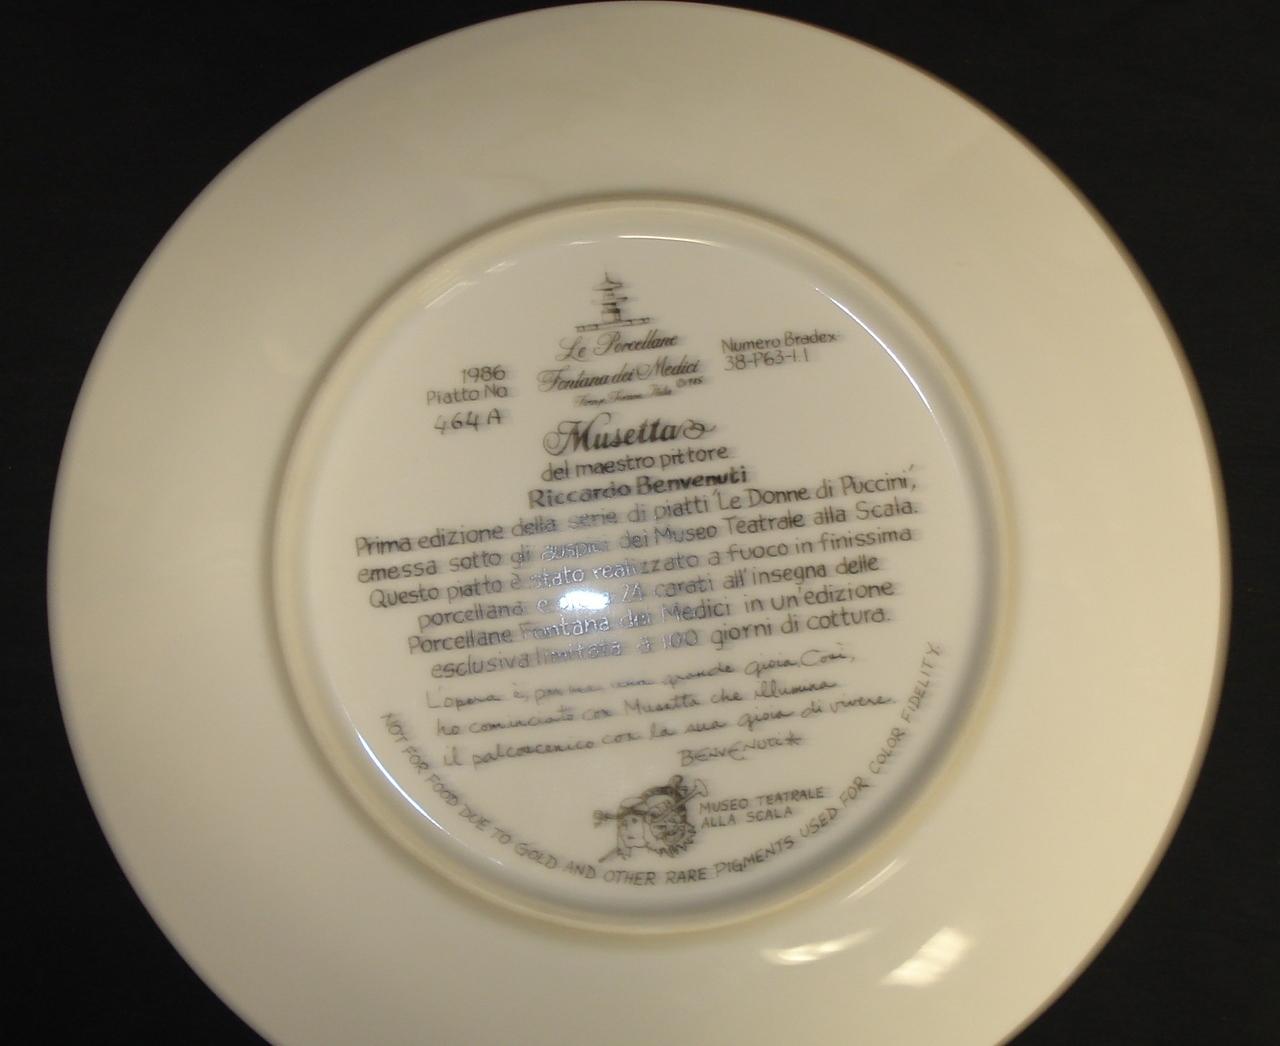 Musetta, Bradex Plate No. 38-P63-1.1, Benvenuti